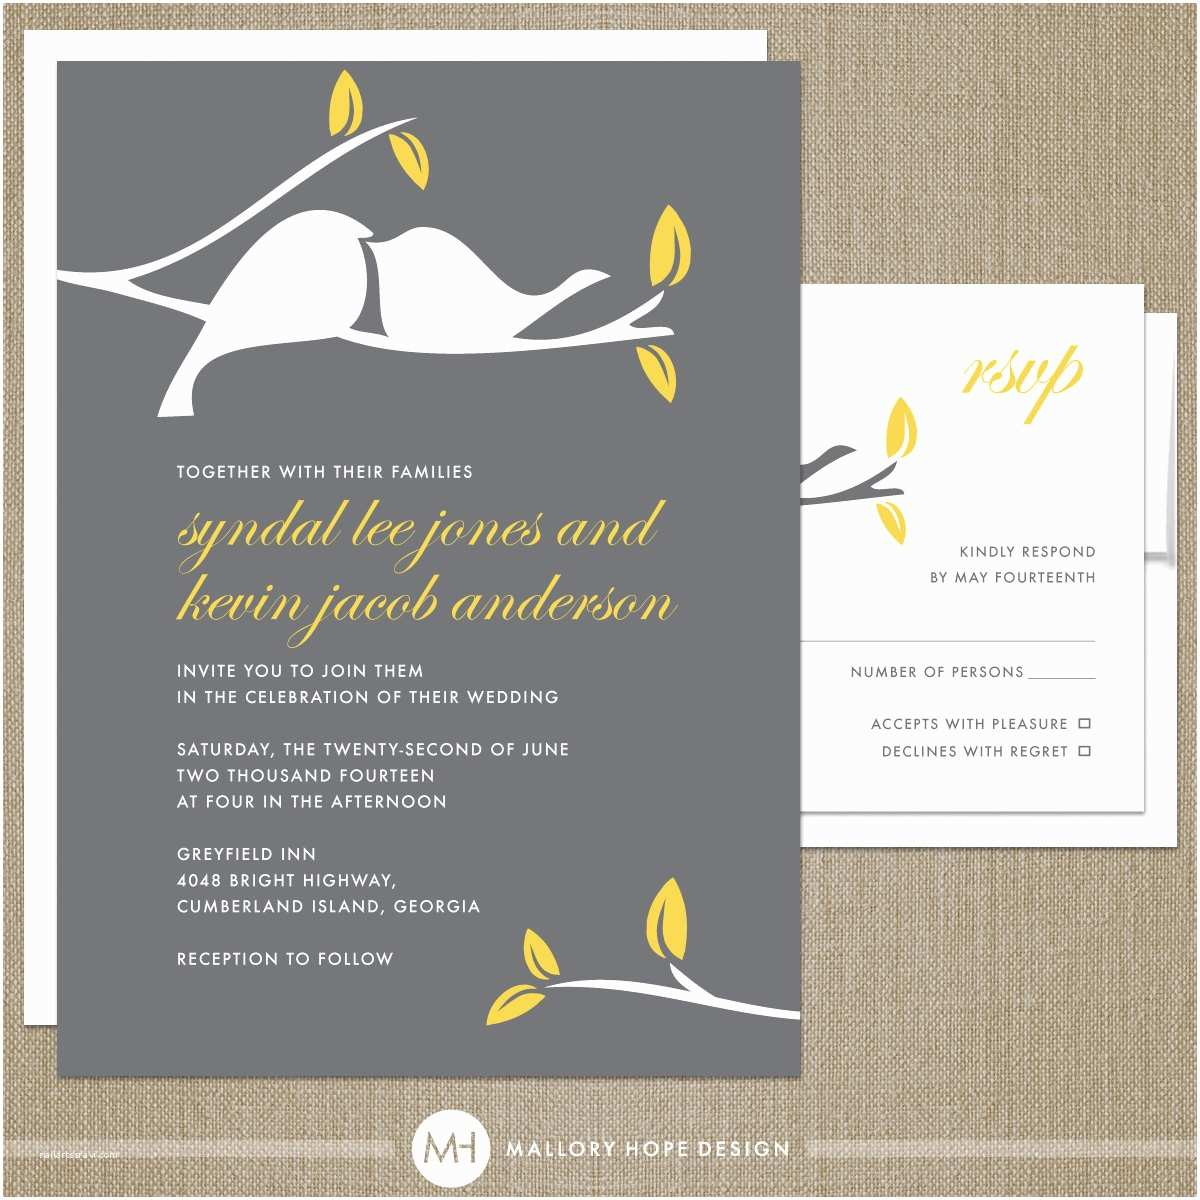 Contemporary Wedding Invitations Awe Inspiring Contemporary Wedding Invitations To